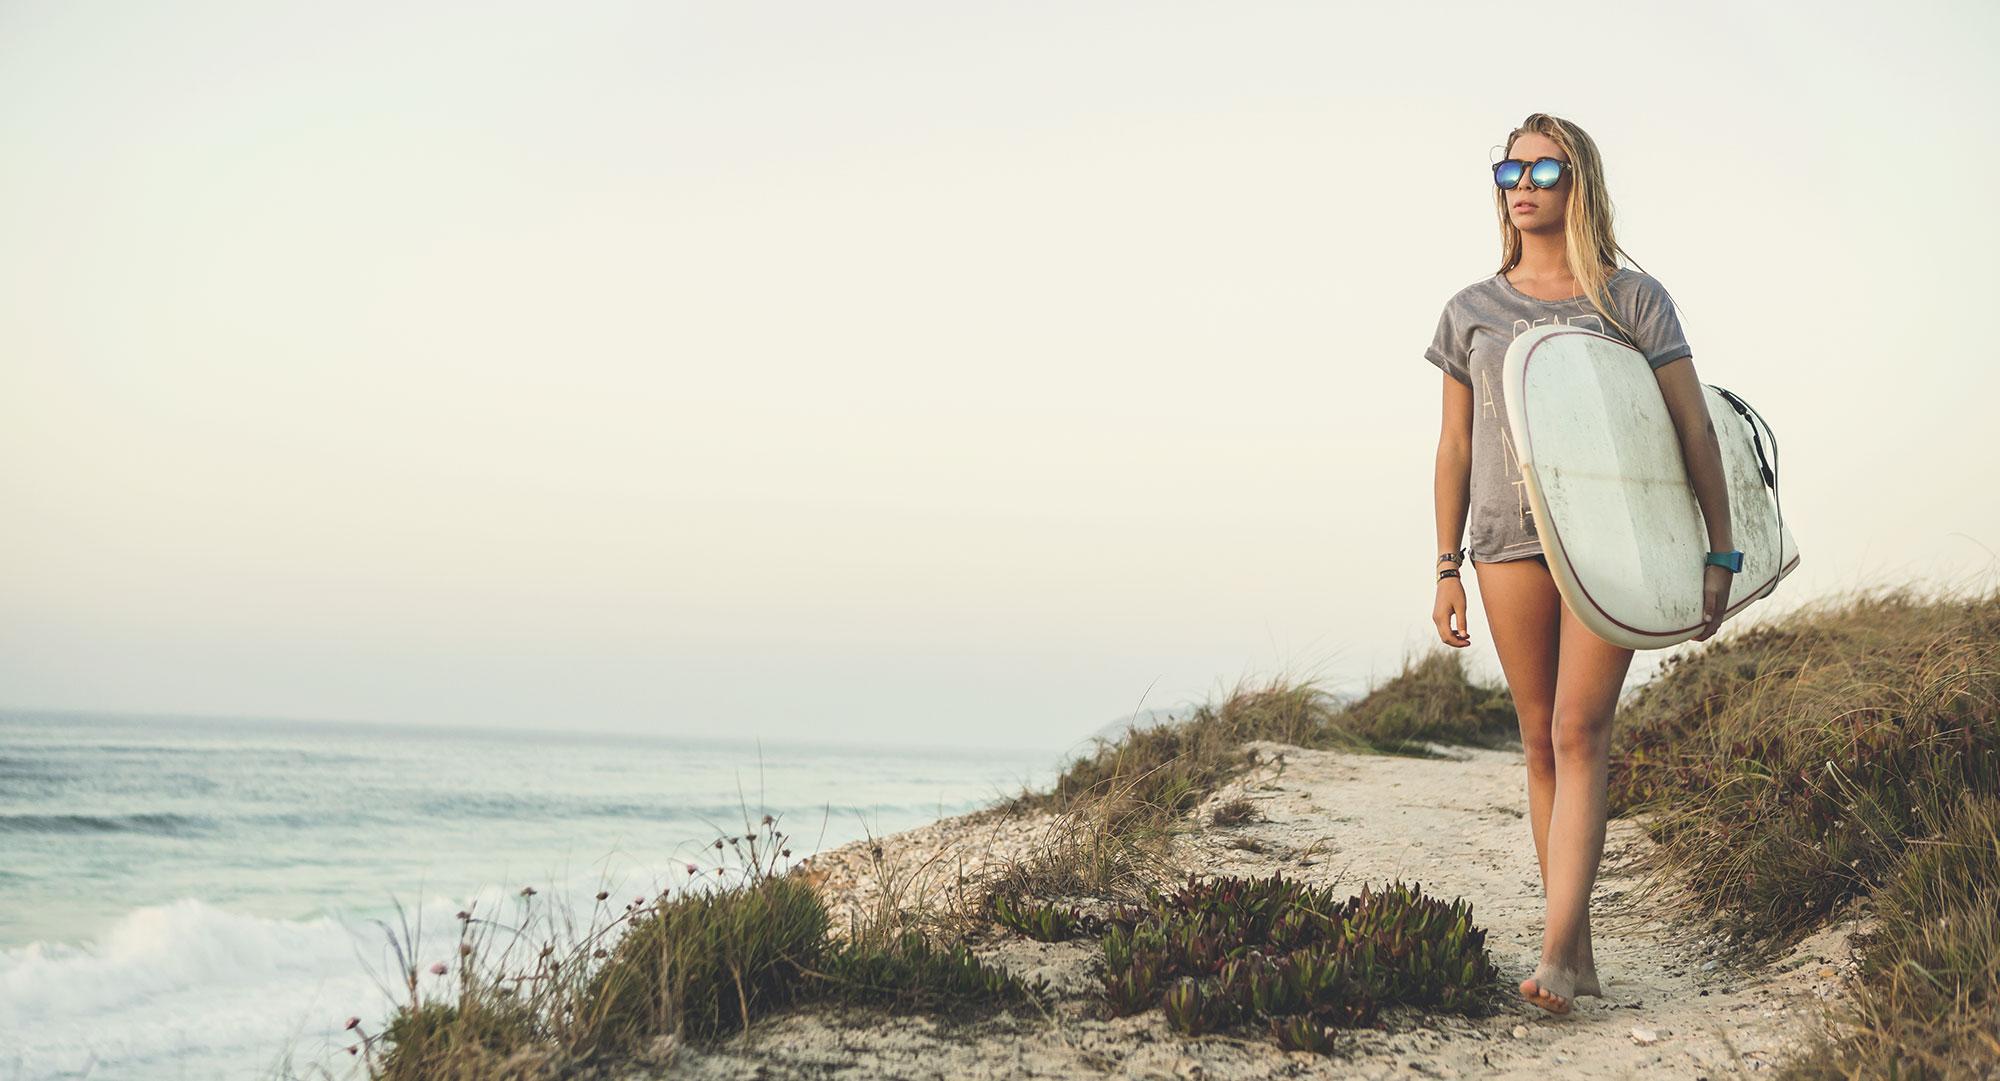 BLONDE SURF GIRL